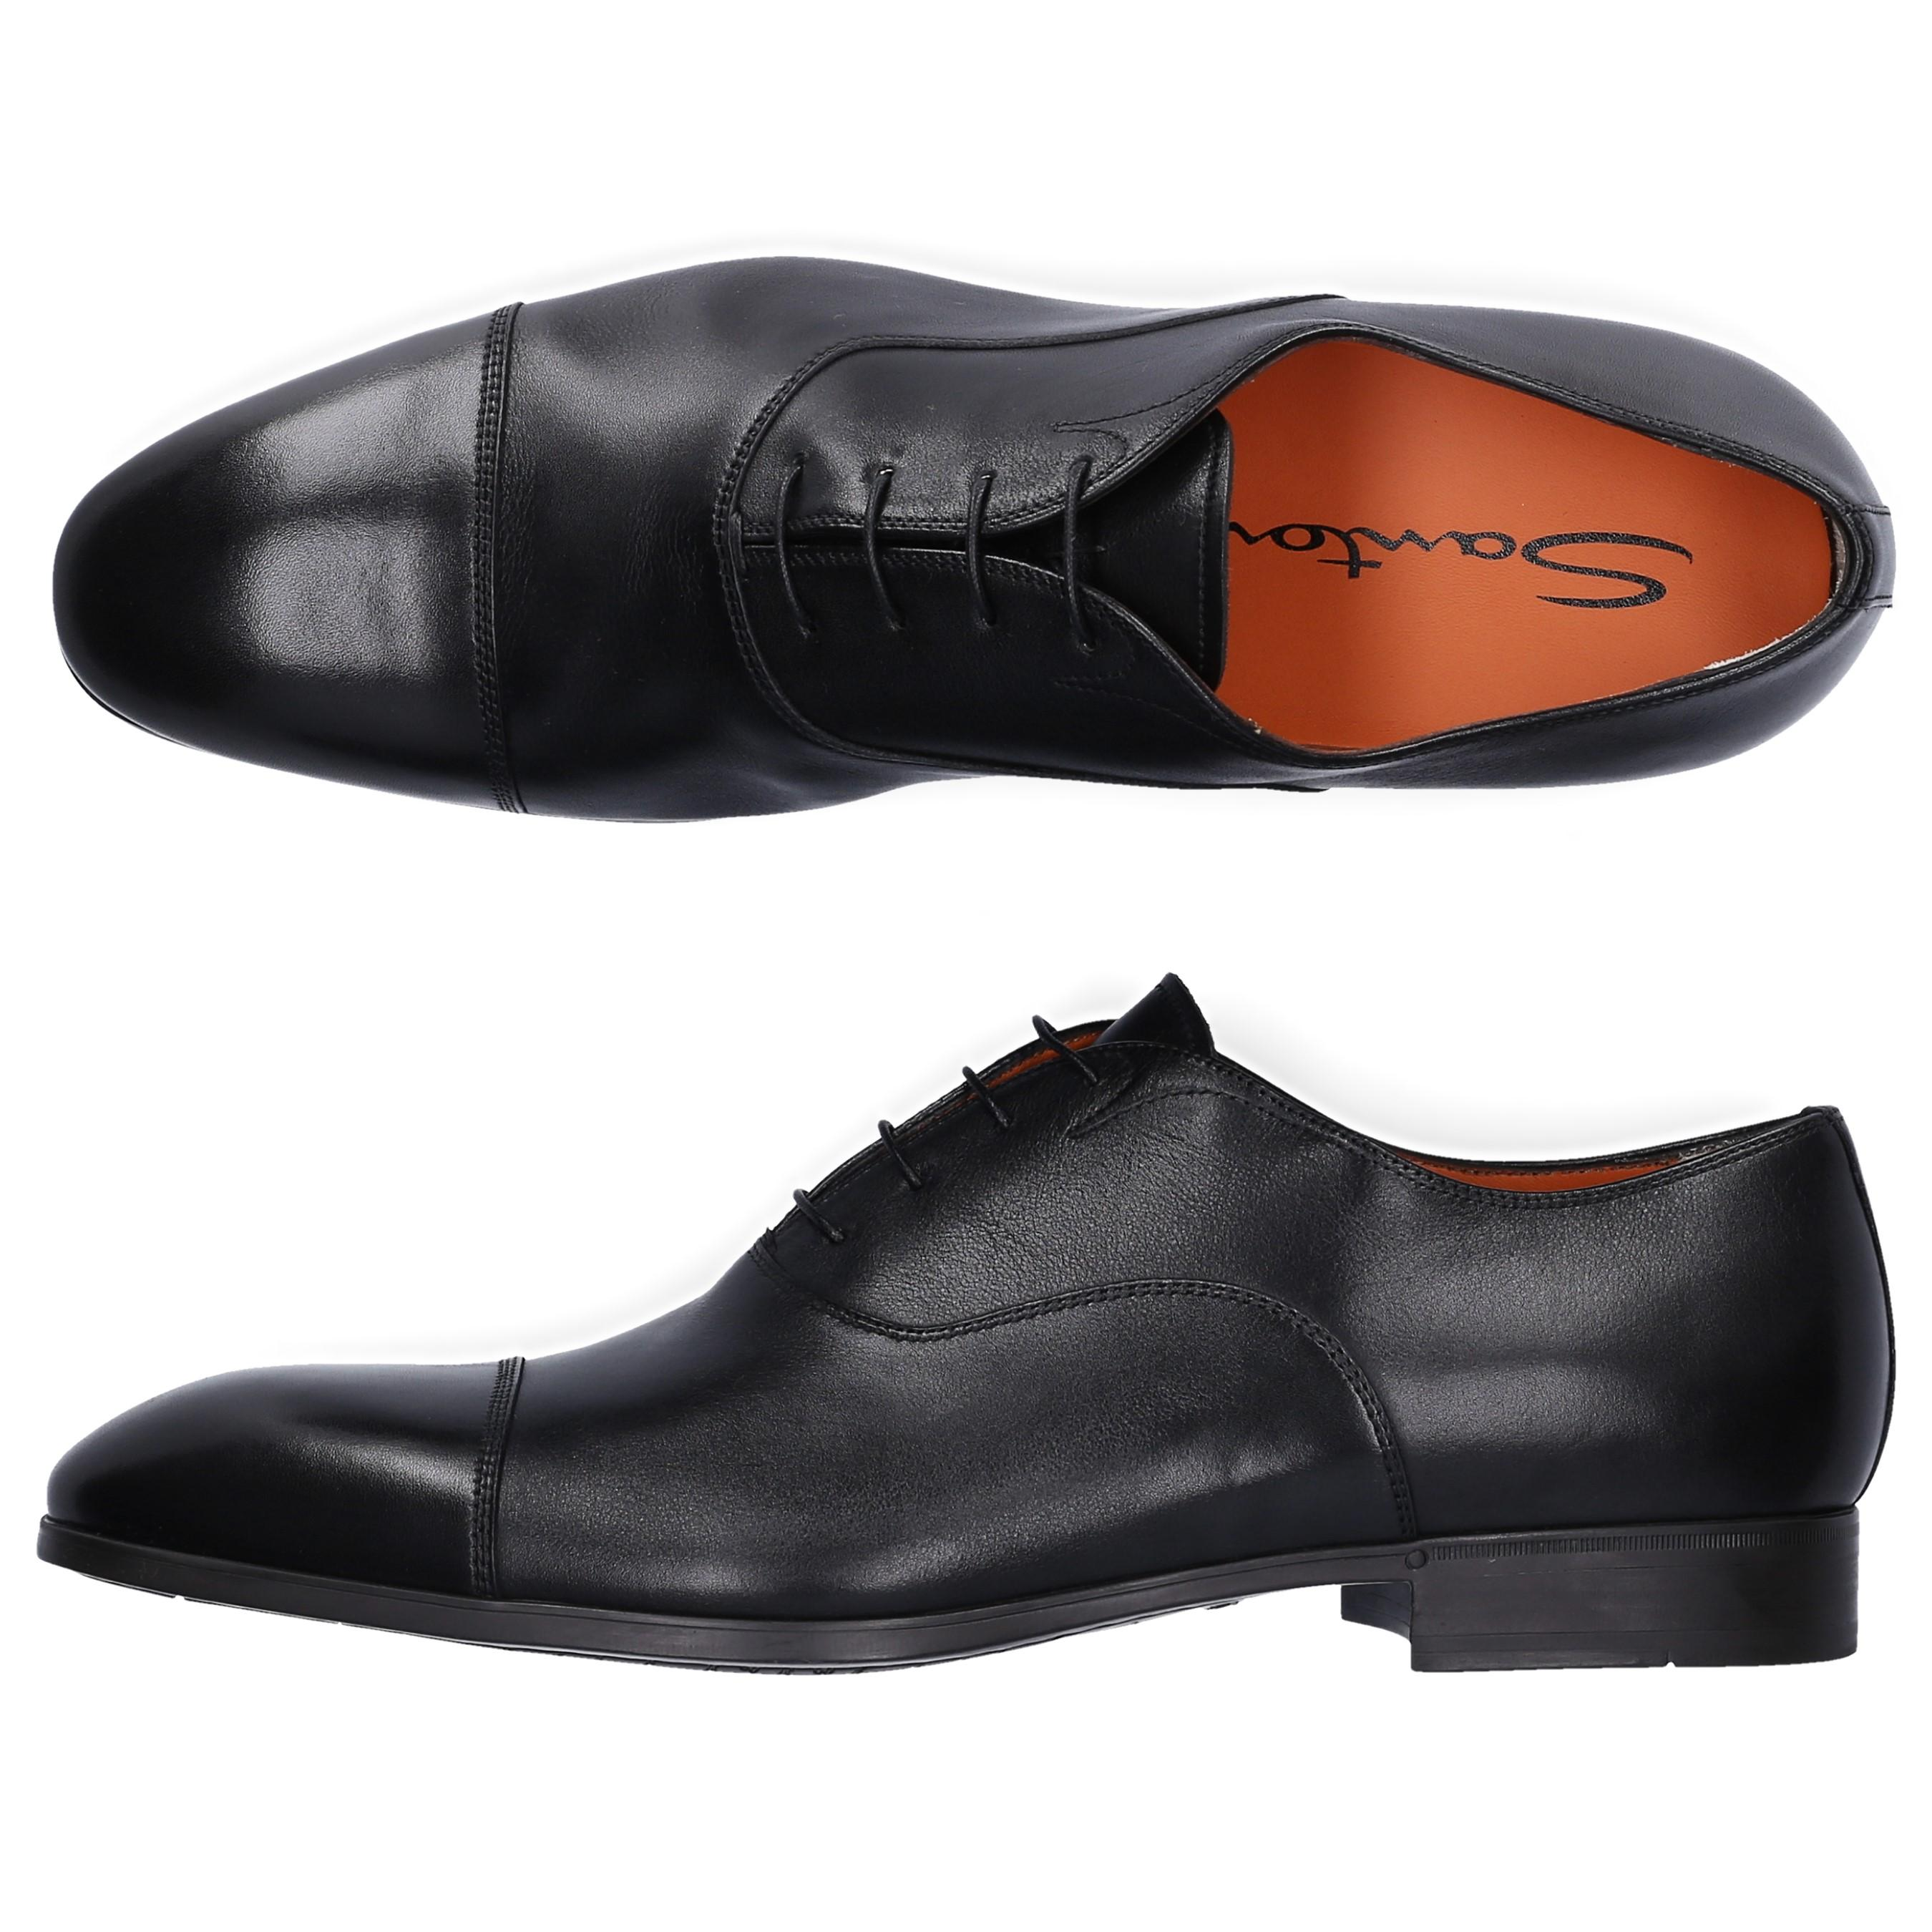 0f6b97bae27326 Santoni - Derby 11011 Leather Black for Men - Lyst. View fullscreen